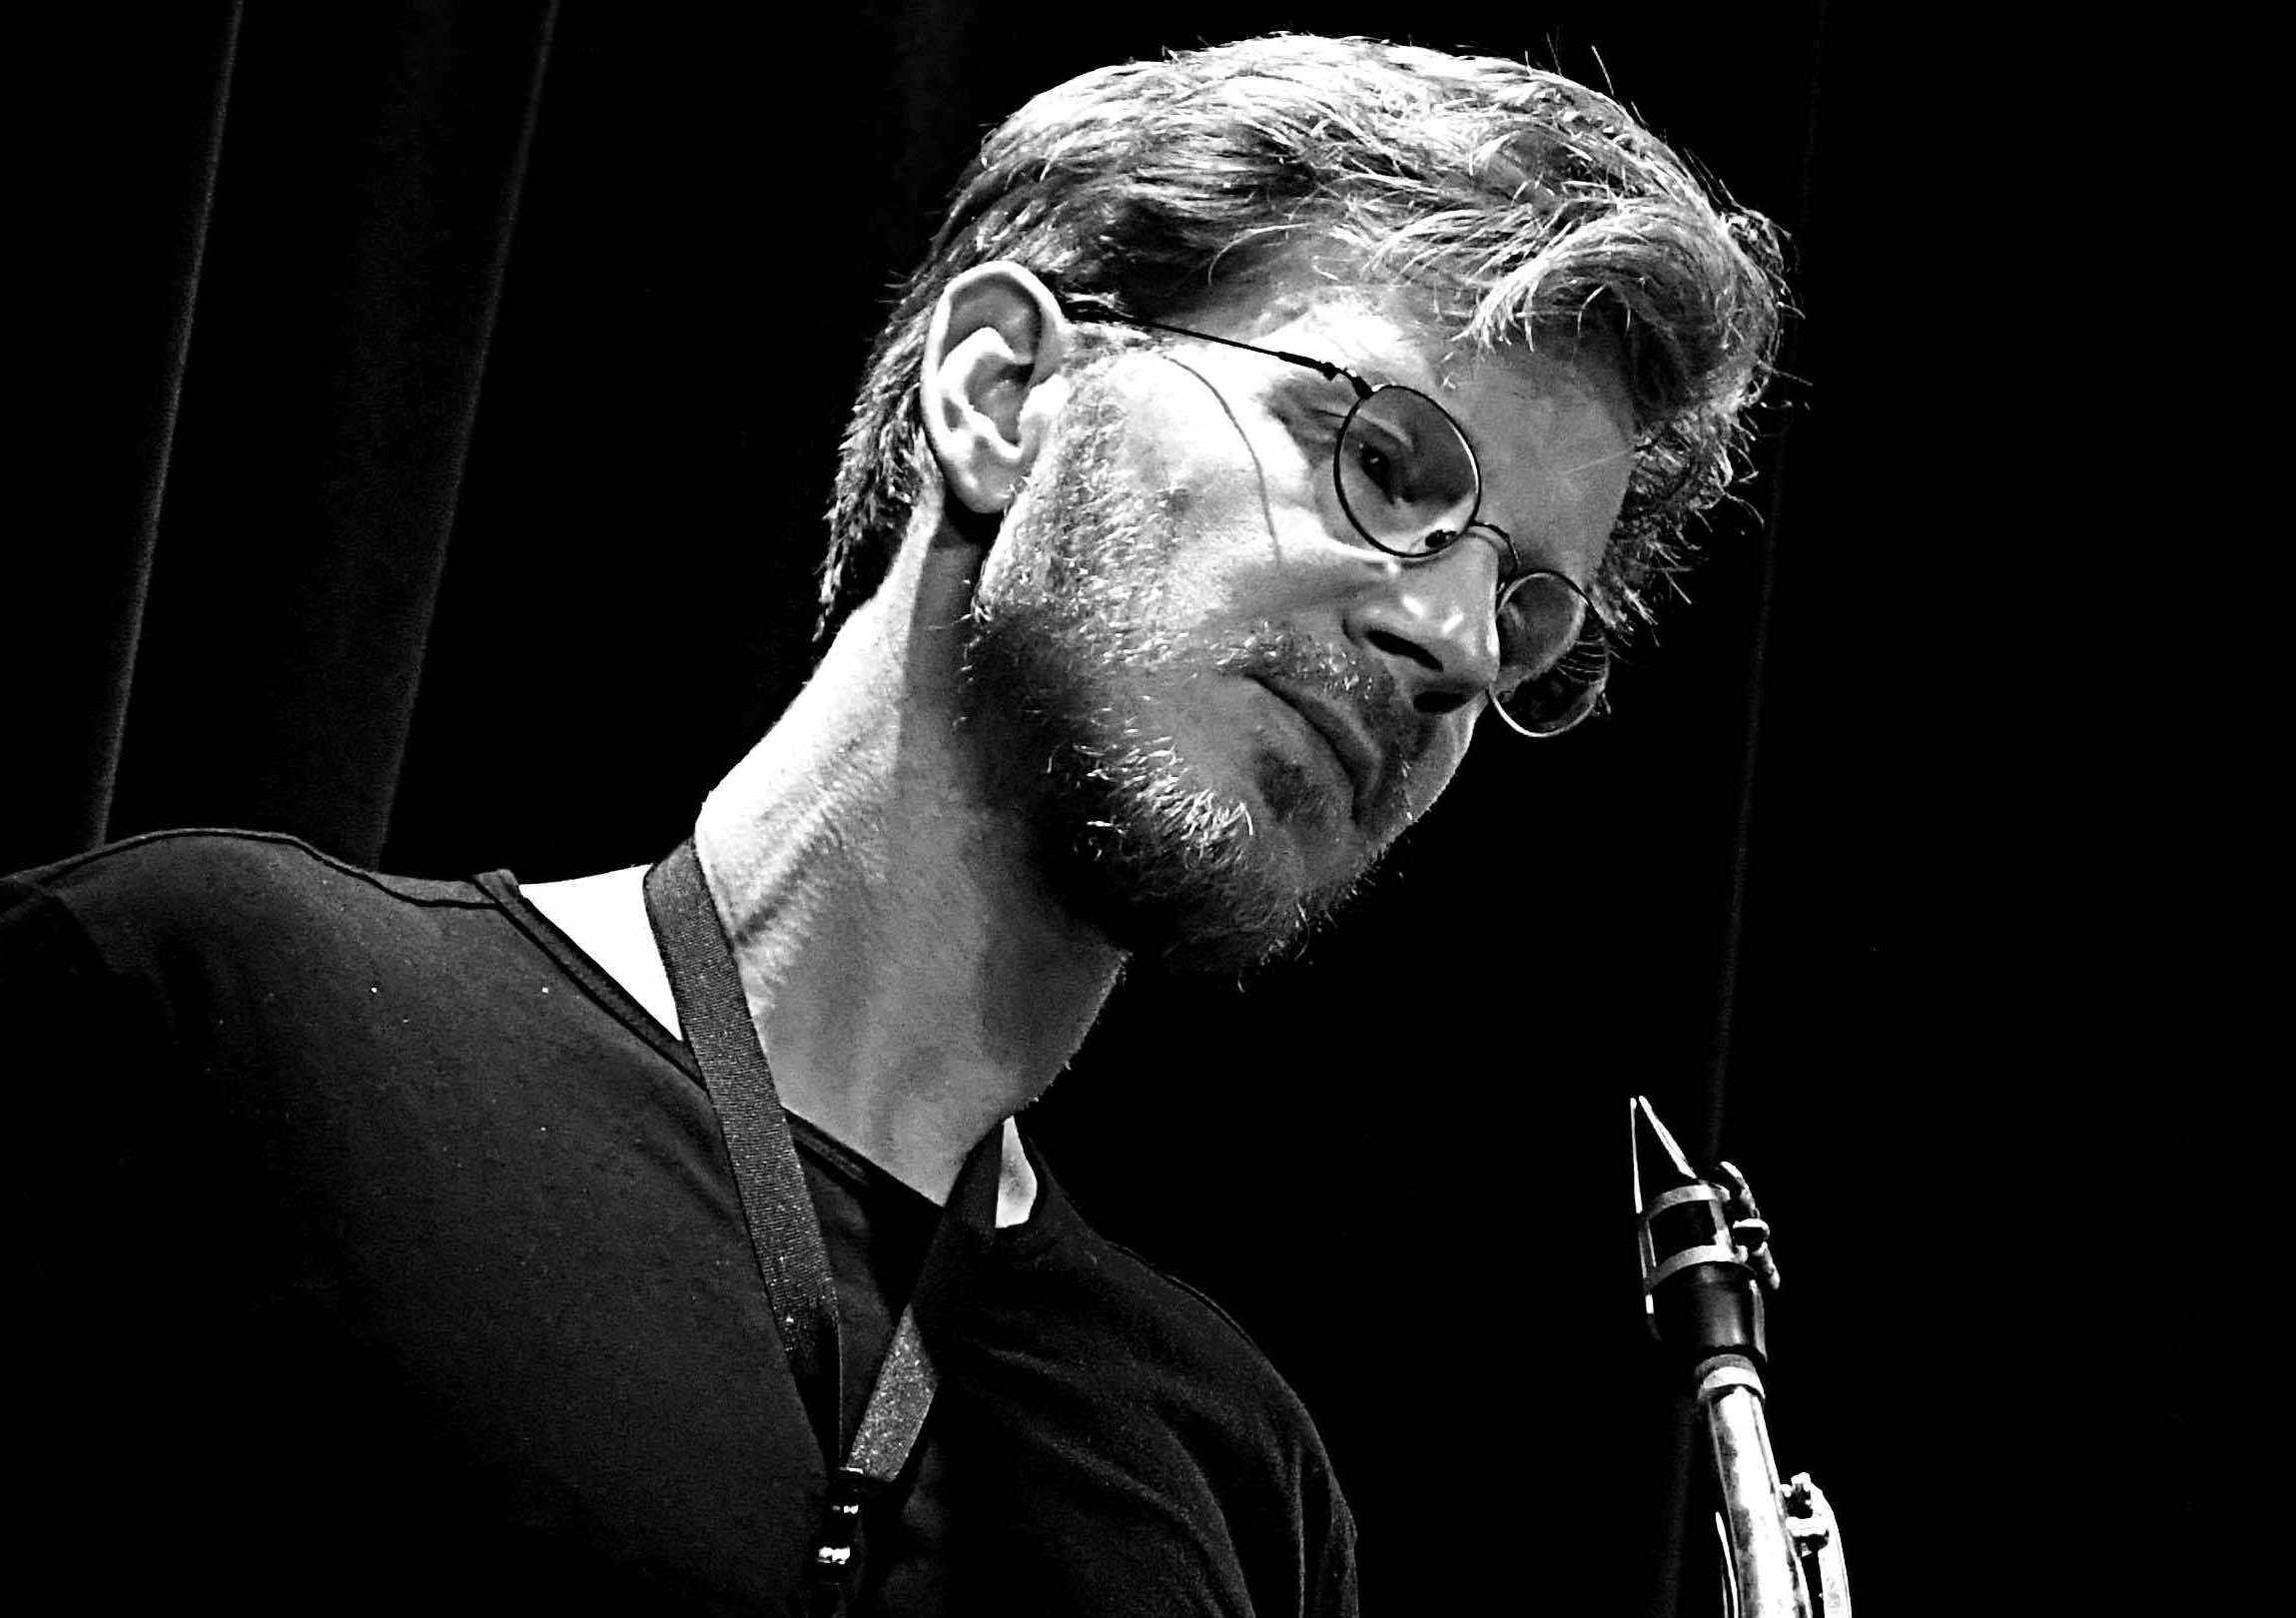 Leonhard Huhn